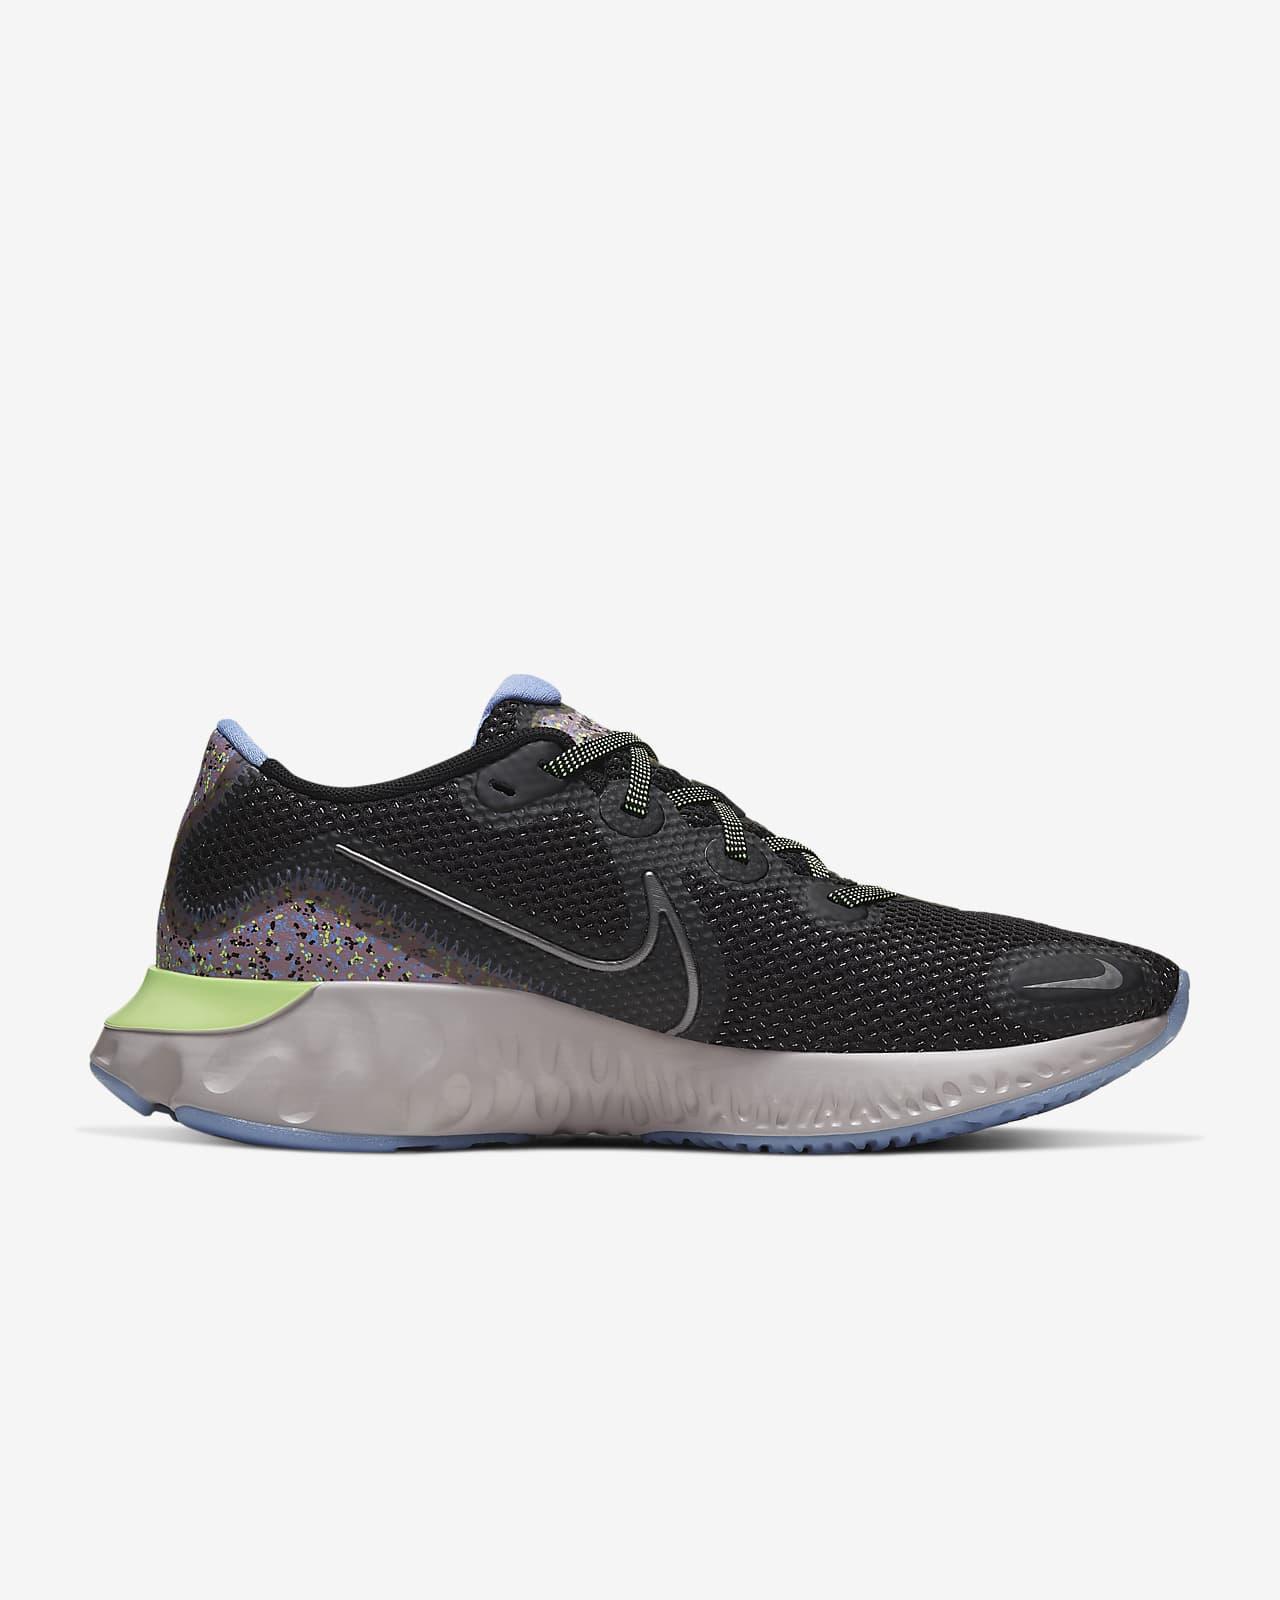 Nike Renew Run Special Edition Women's